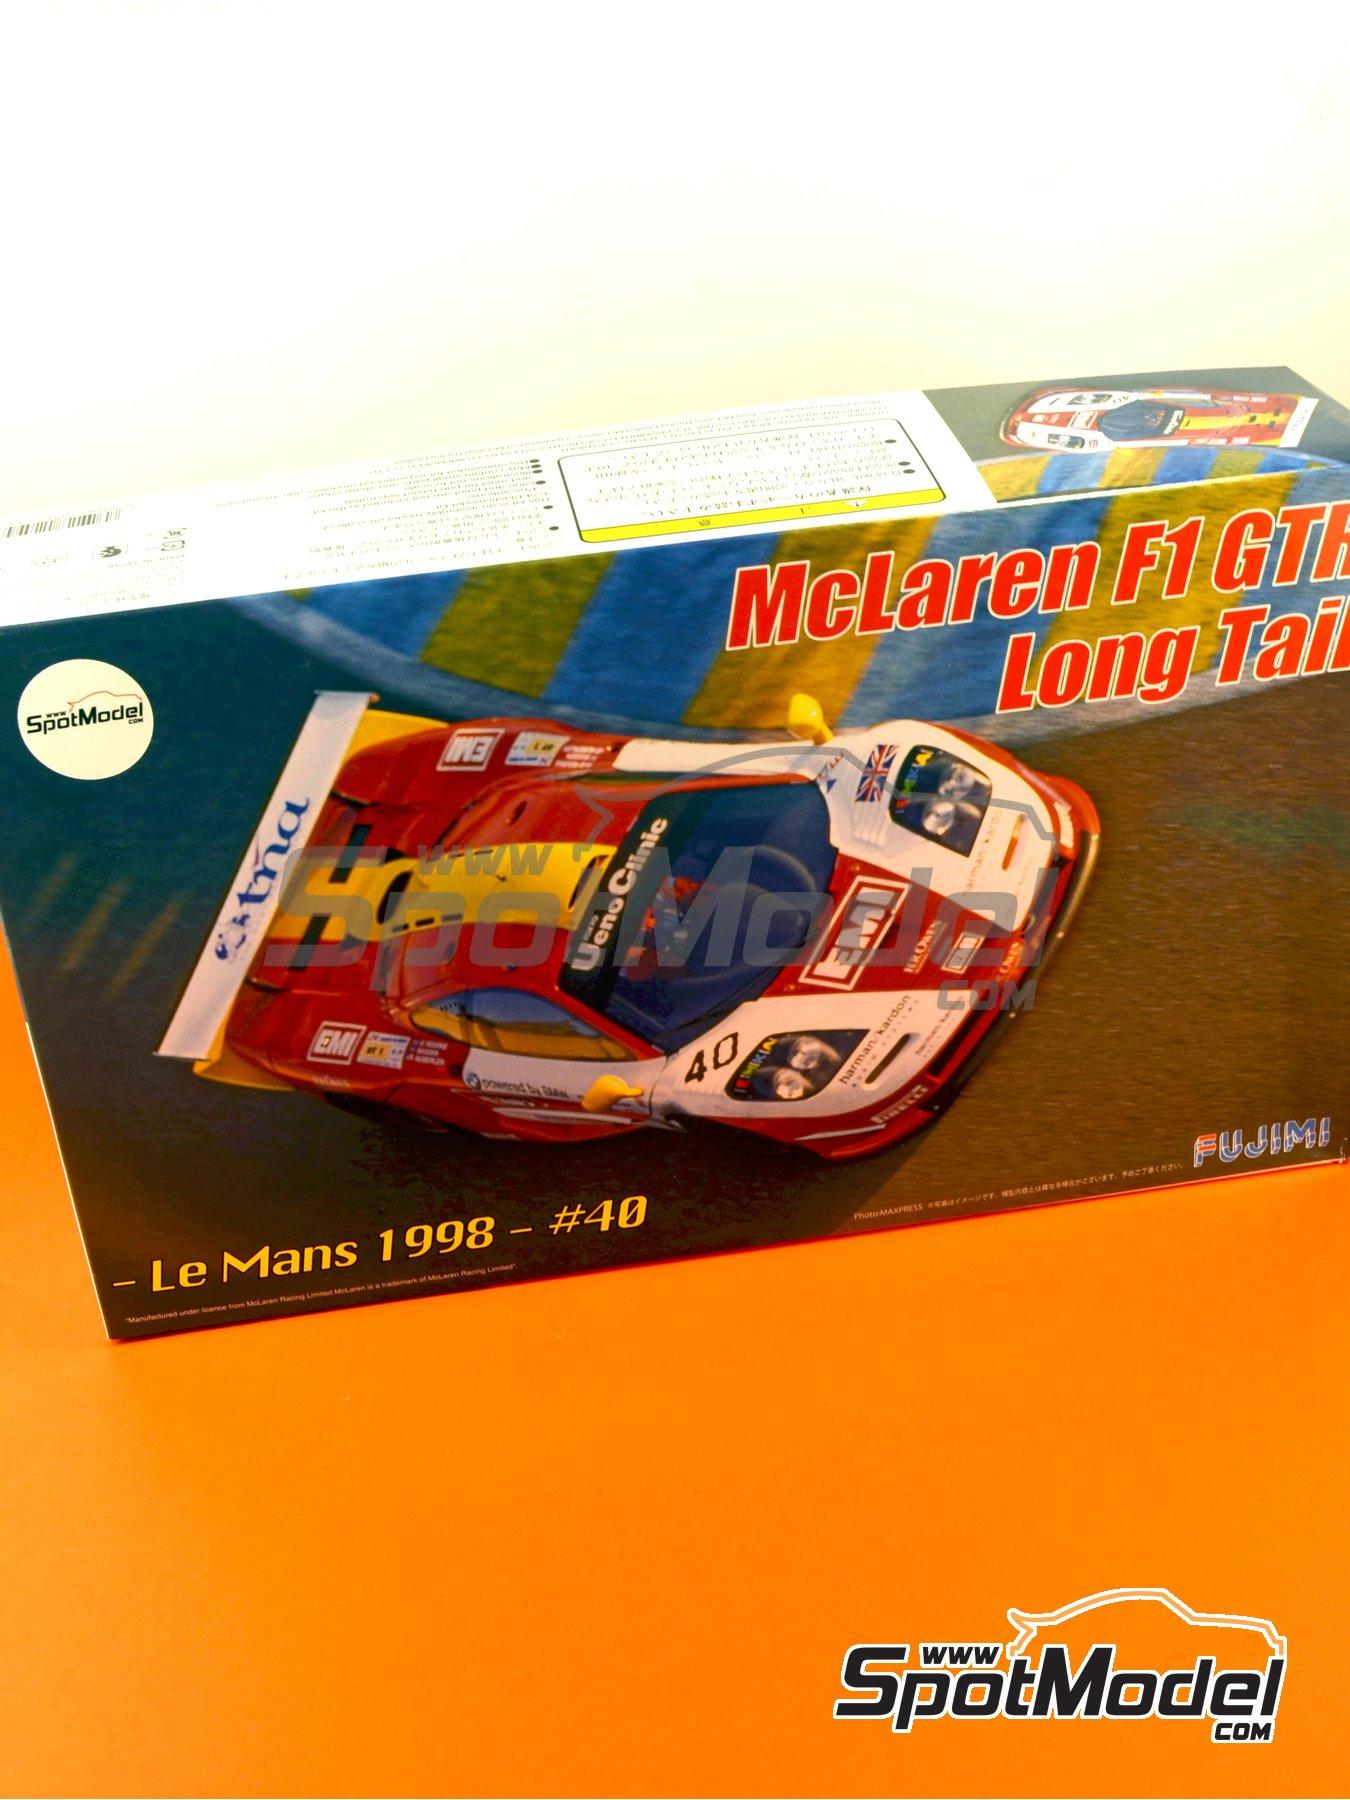 McLaren F1 GTR Long Tail EMI - 24 Horas de Le Mans 1998 | Maqueta de coche en escala1/24 fabricado por Fujimi (ref.FJ12594) image